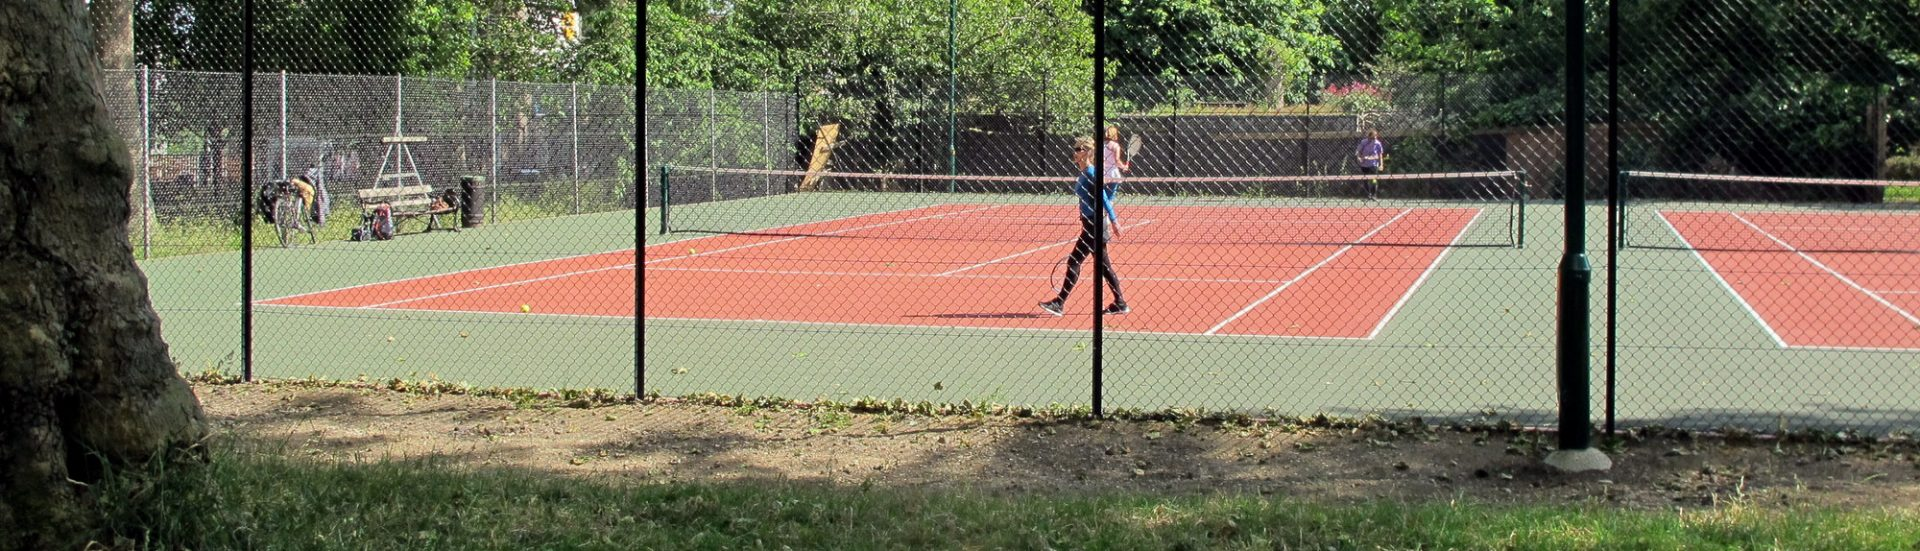 Tennis on Highbury Fields